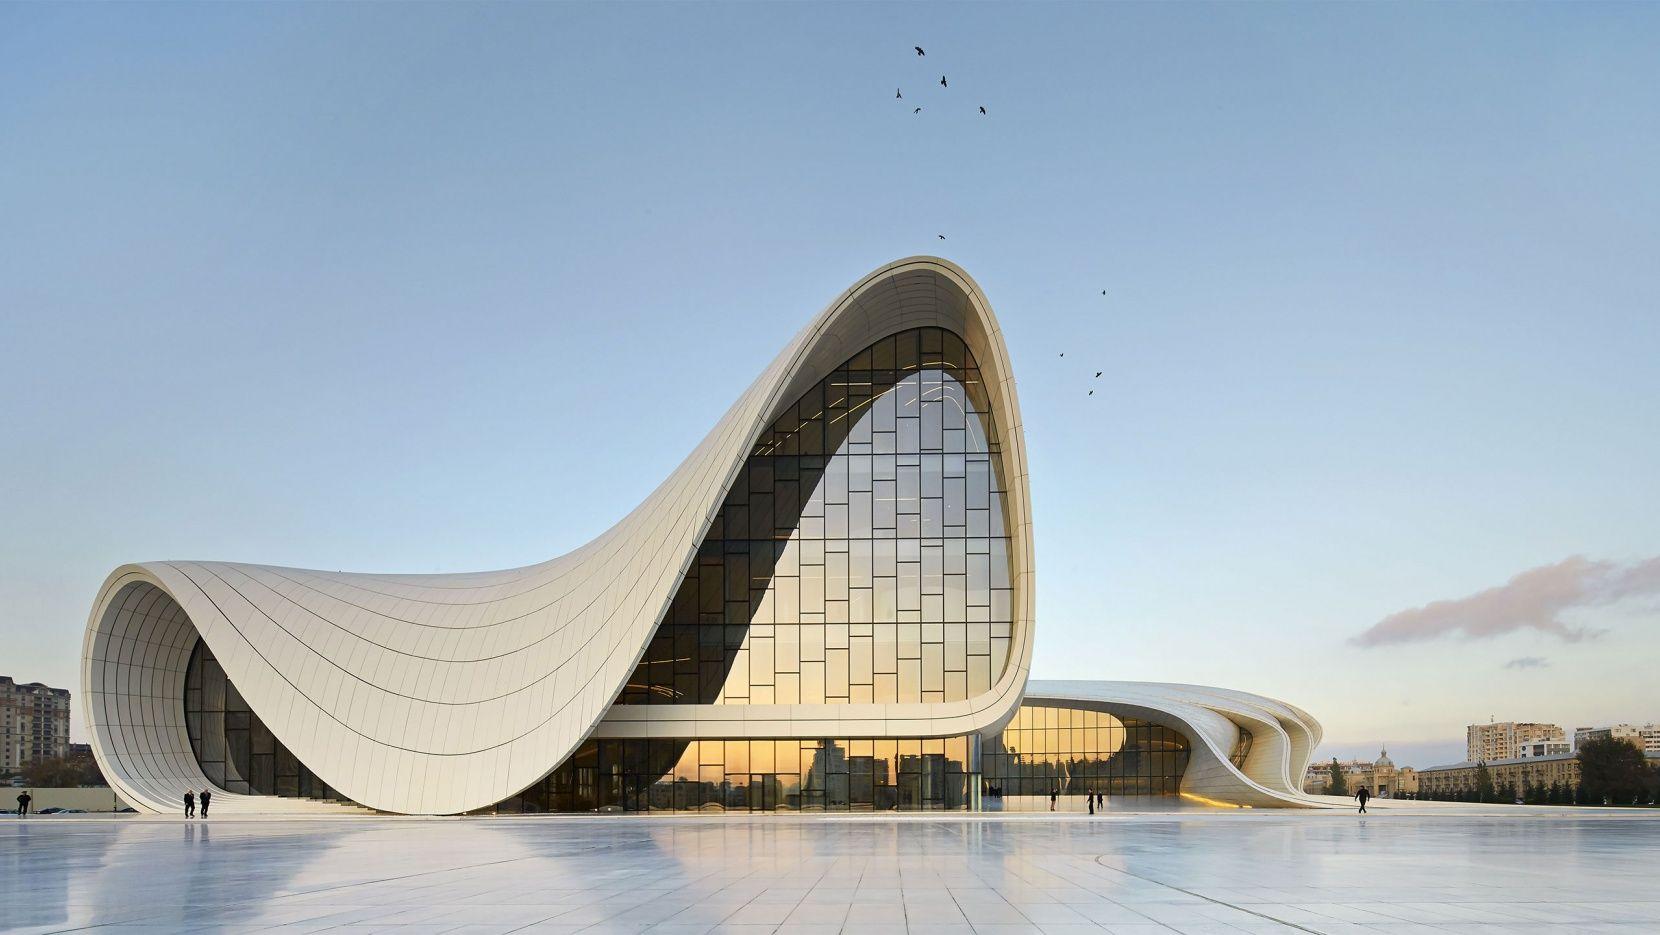 The Heydar Aliyev Center By Zaha Hadid Architects In Baku Azerbaijan Yatzer Zaha Hadid Architecture Zaha Hadid Zaha Hadid Design